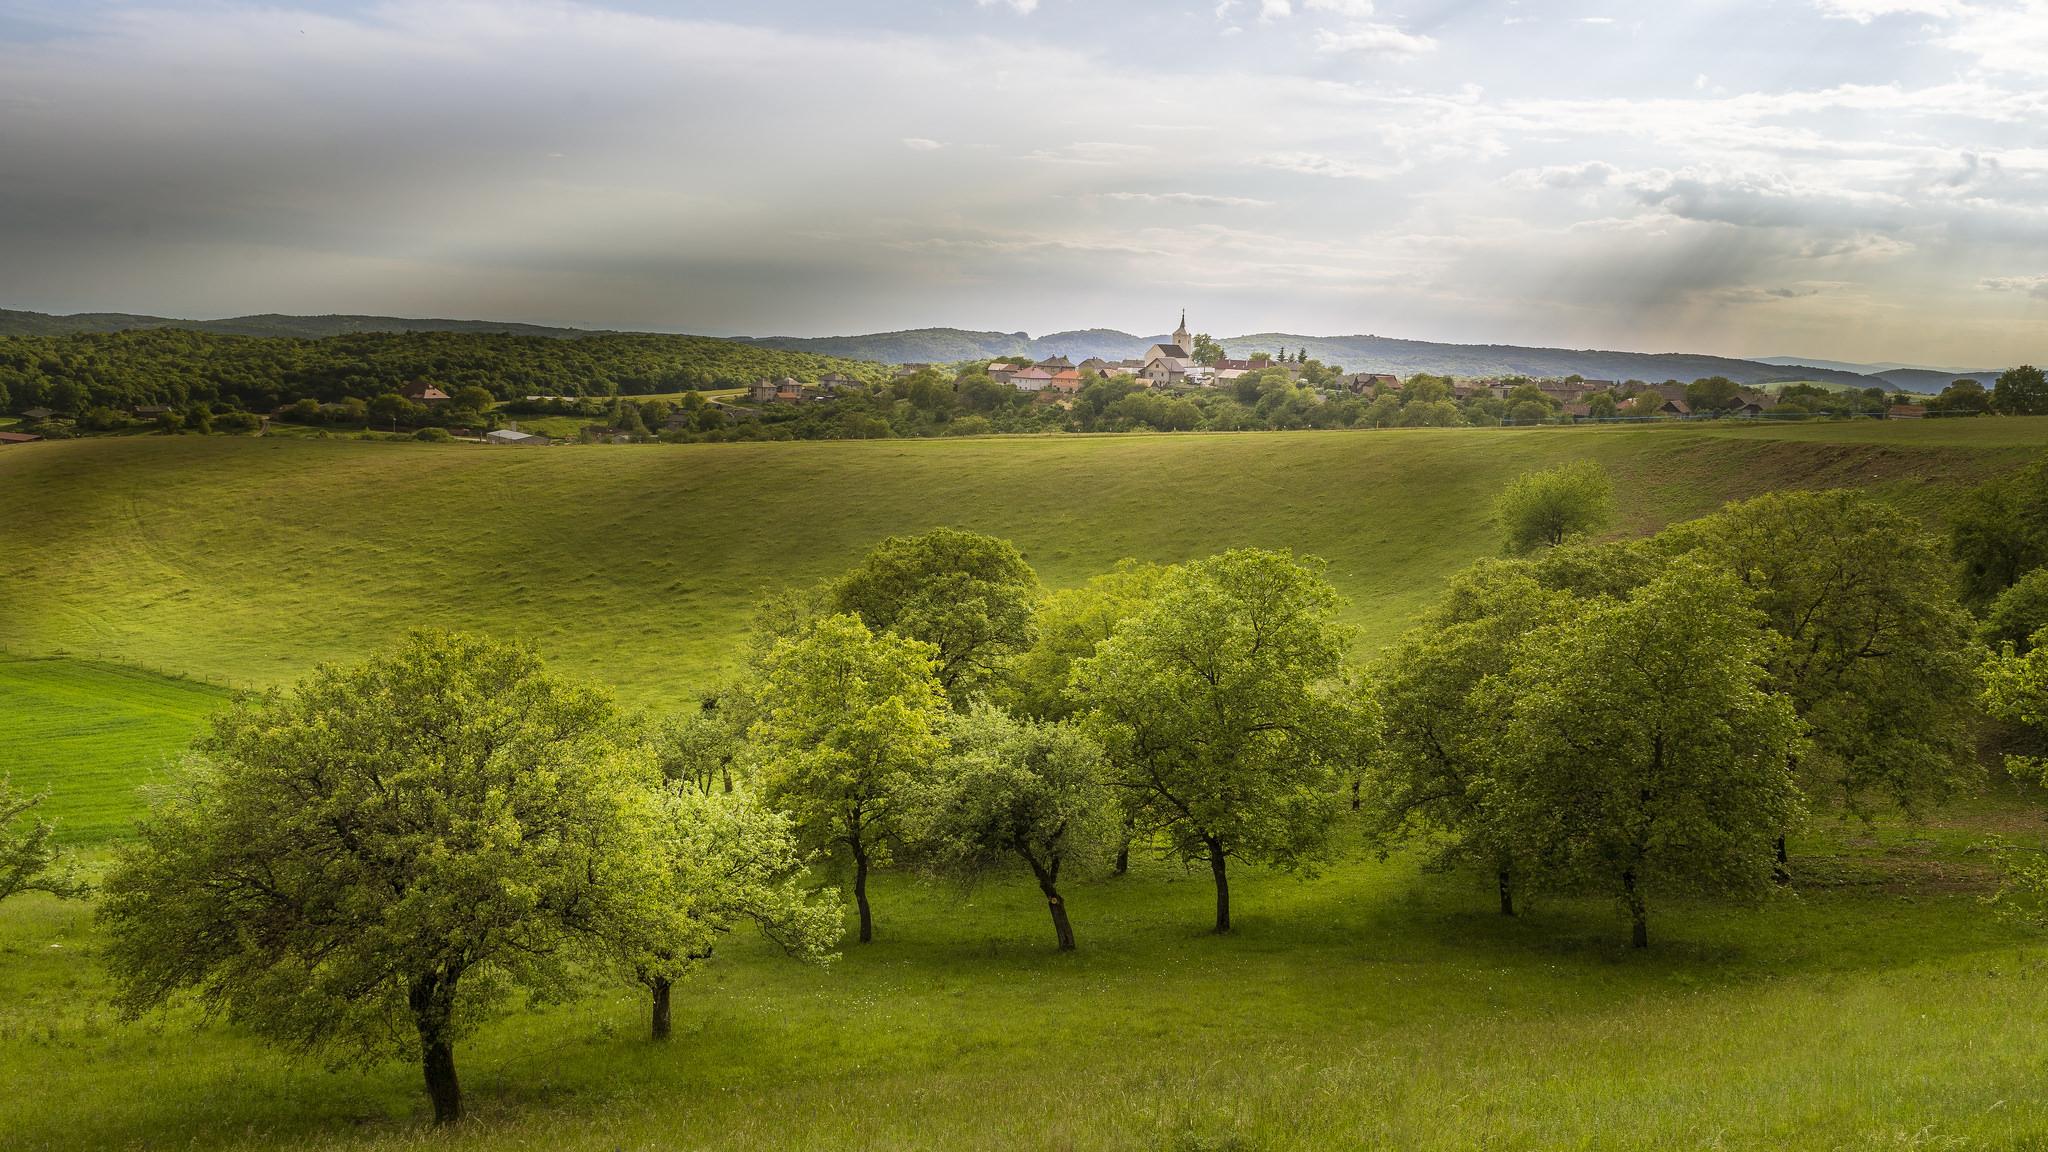 обои Silica, Словакия, Средняя Европа, холмы картинки фото